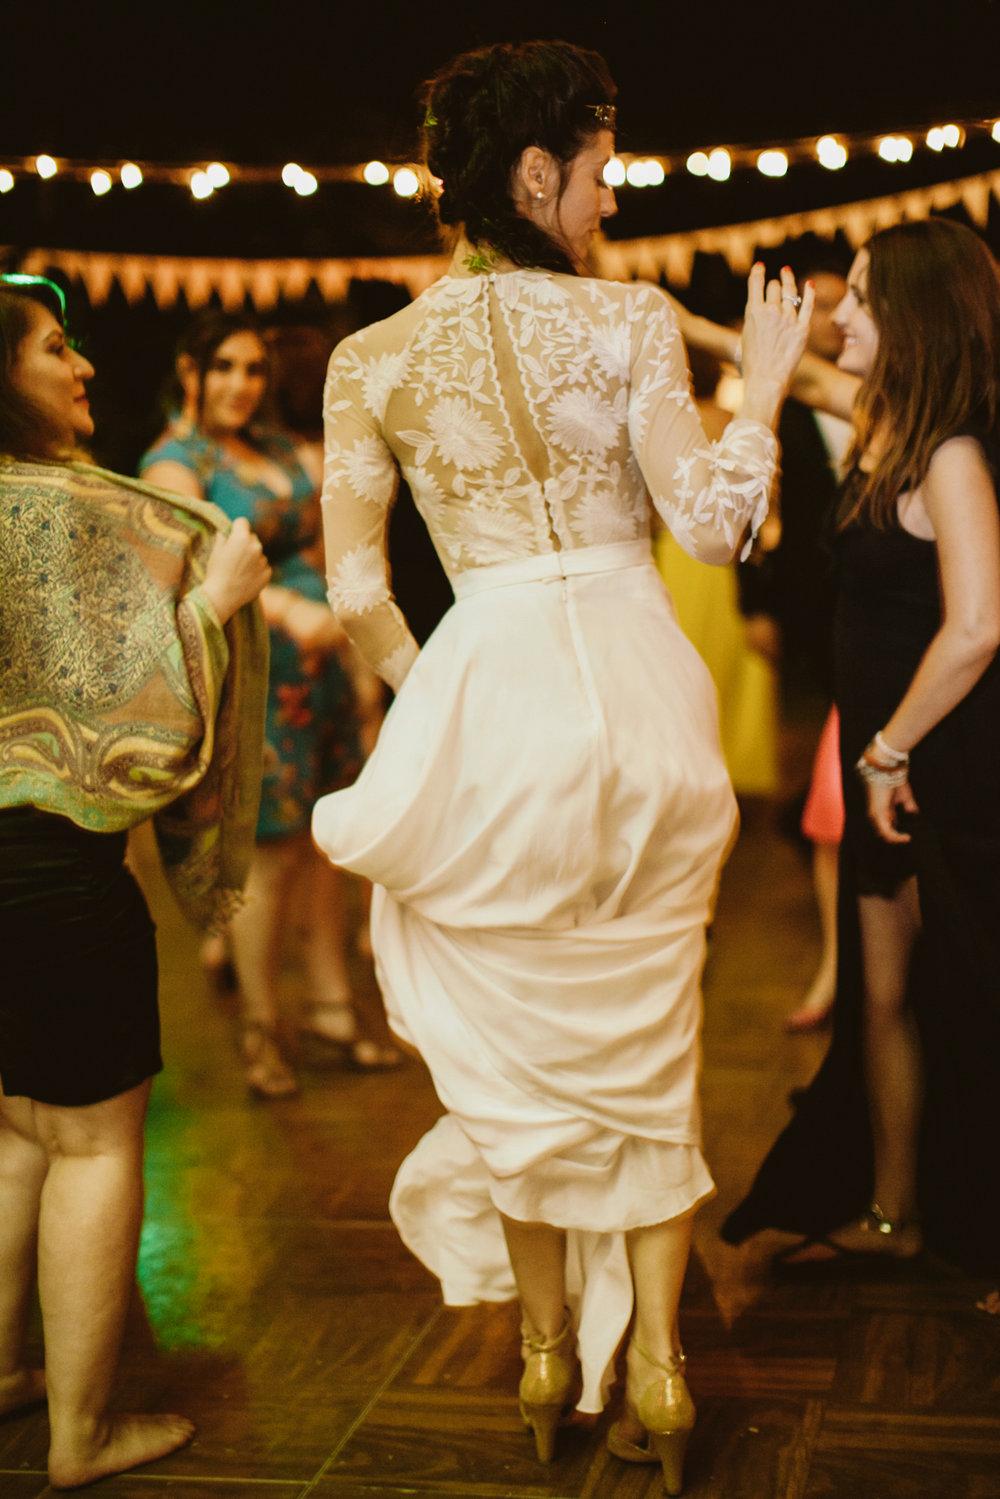 Kimberly-Coccagnia-Wedding-Photographer-1-43.JPG